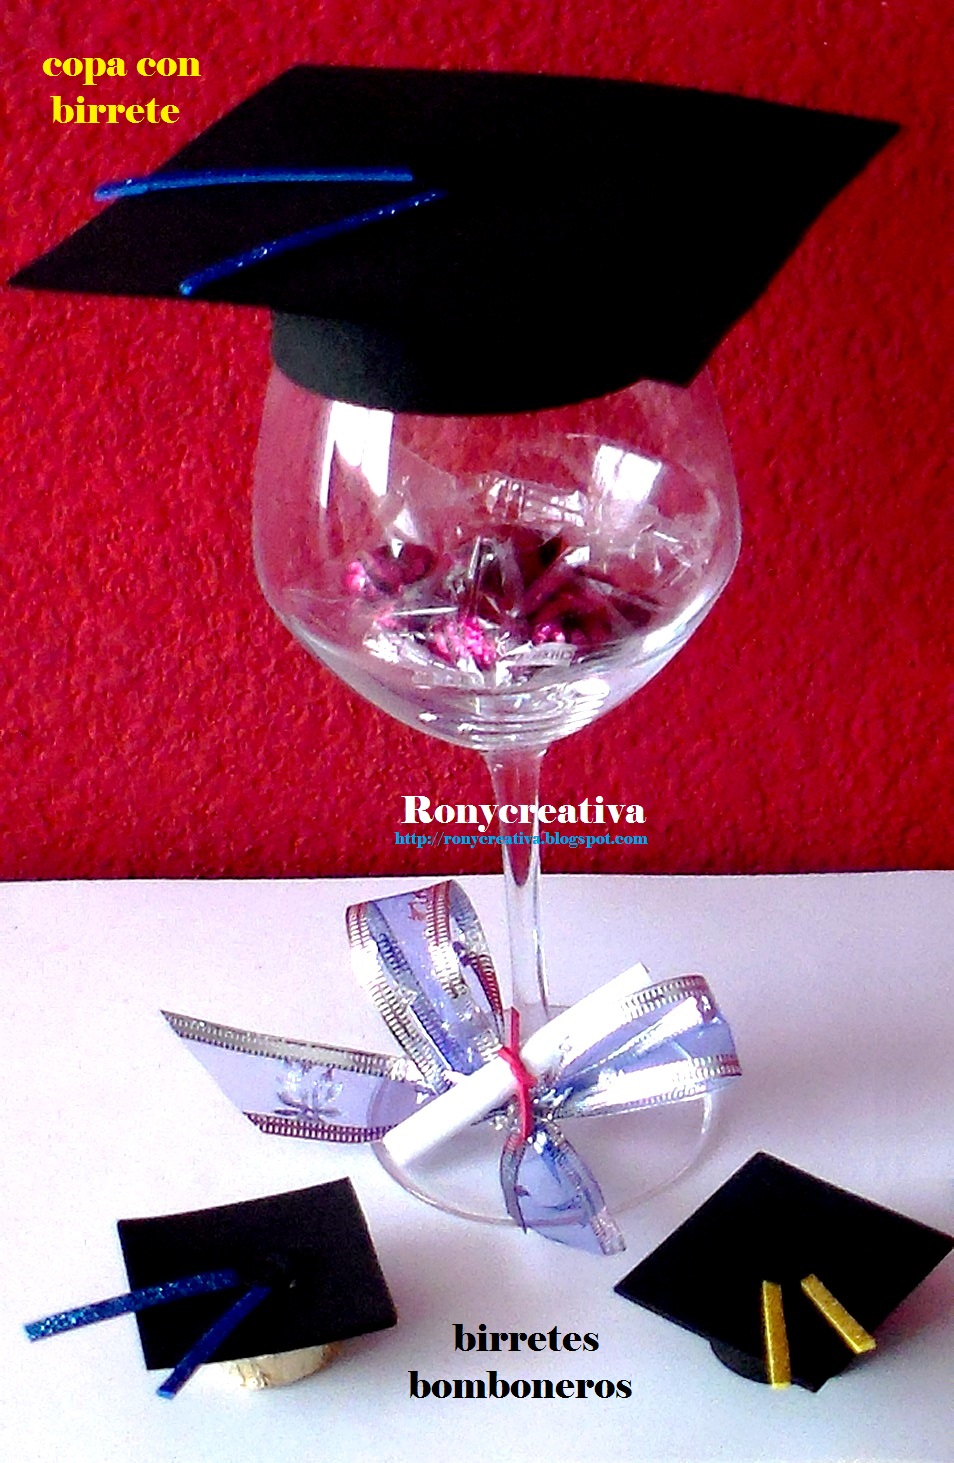 Ronycreativa blog de manualidades 20 ideas para - Blog de manualidades y decoracion ...